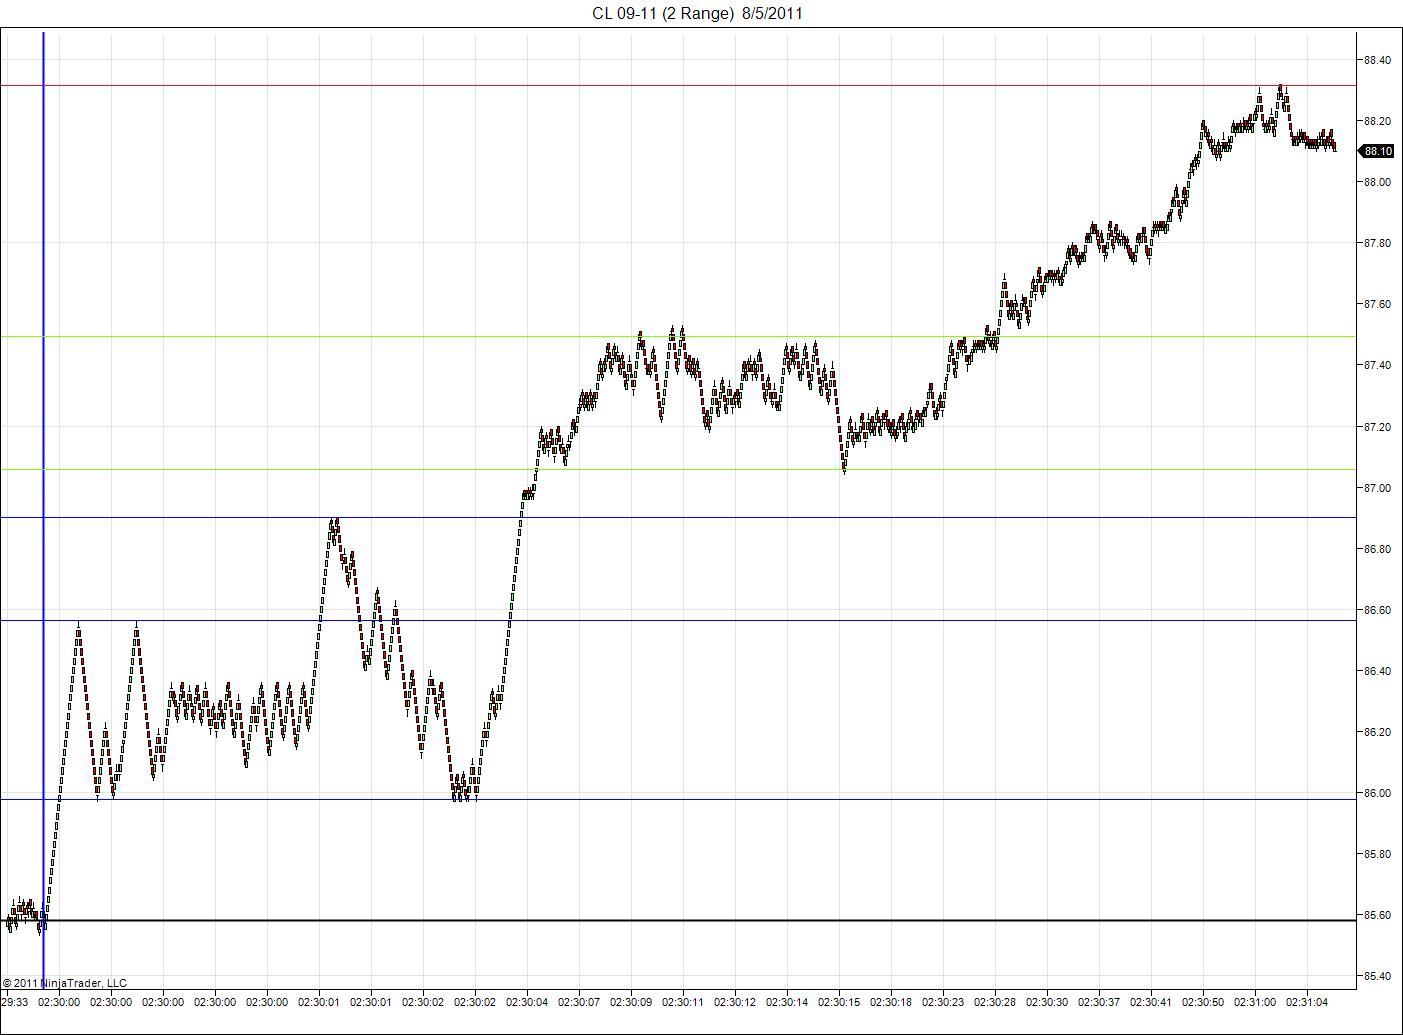 CL 09 11 (2 Range) 08.05.11